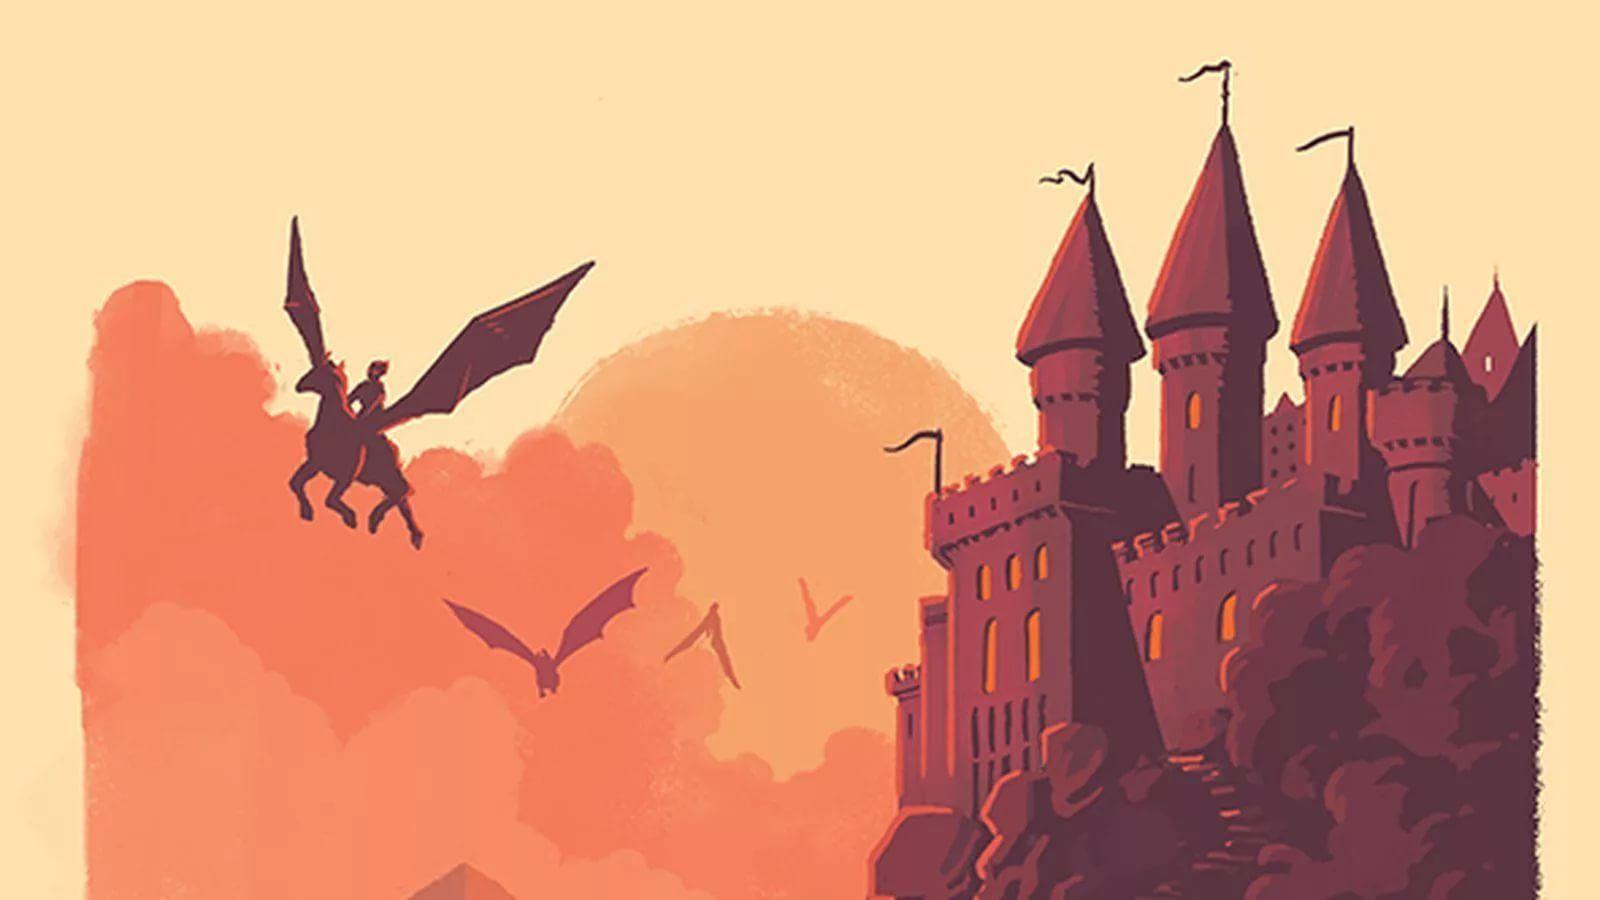 Harry Potter Laptop Wallpapers - Wallpaper Cave